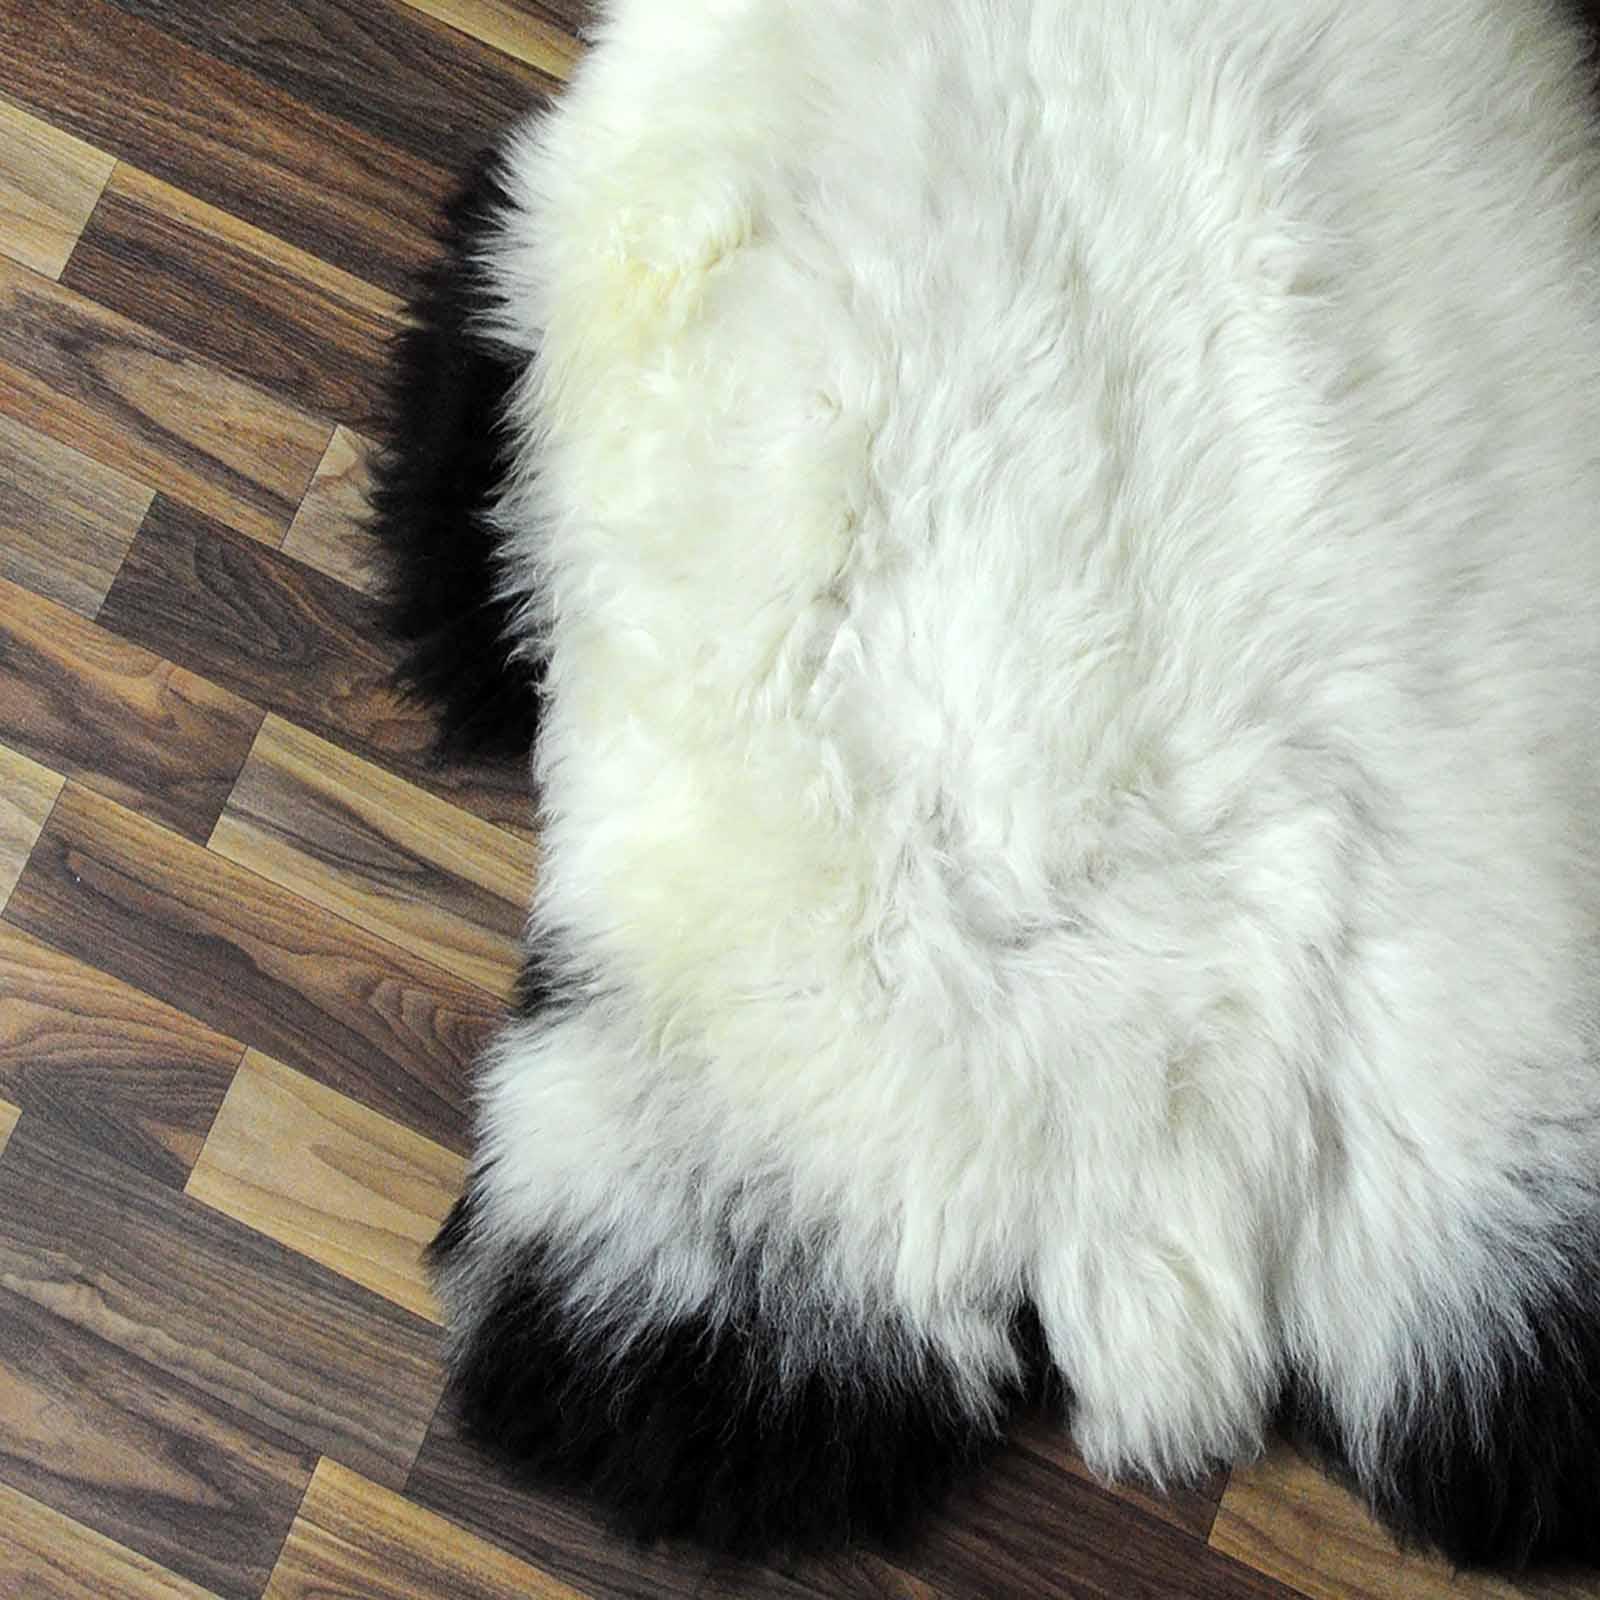 xxl ko schaffell fell lammfell braun grau 120x80 teppich. Black Bedroom Furniture Sets. Home Design Ideas